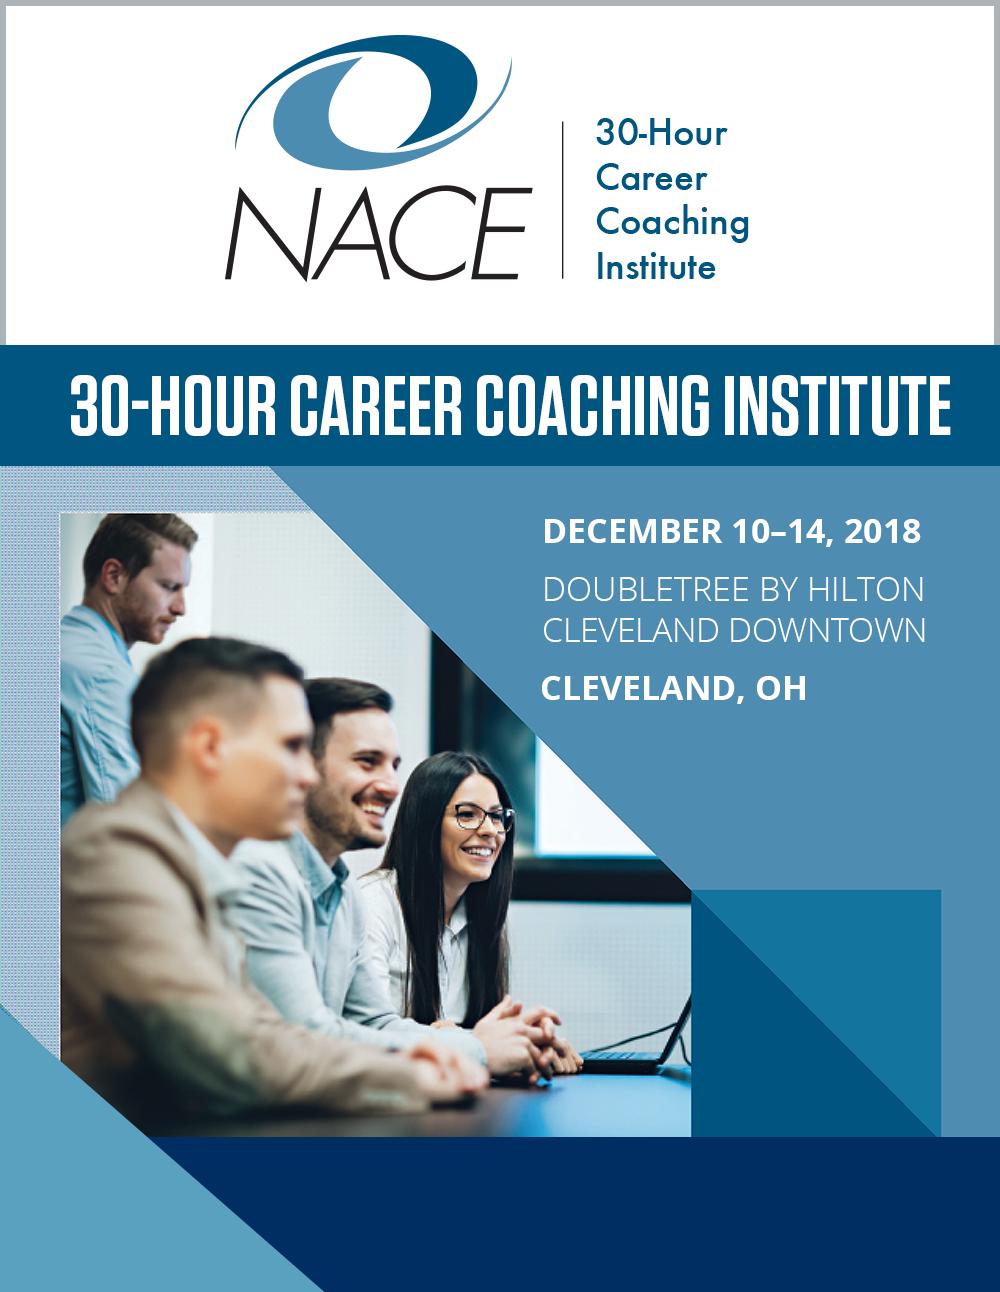 NACE 30-Hour Career Coaching Institute